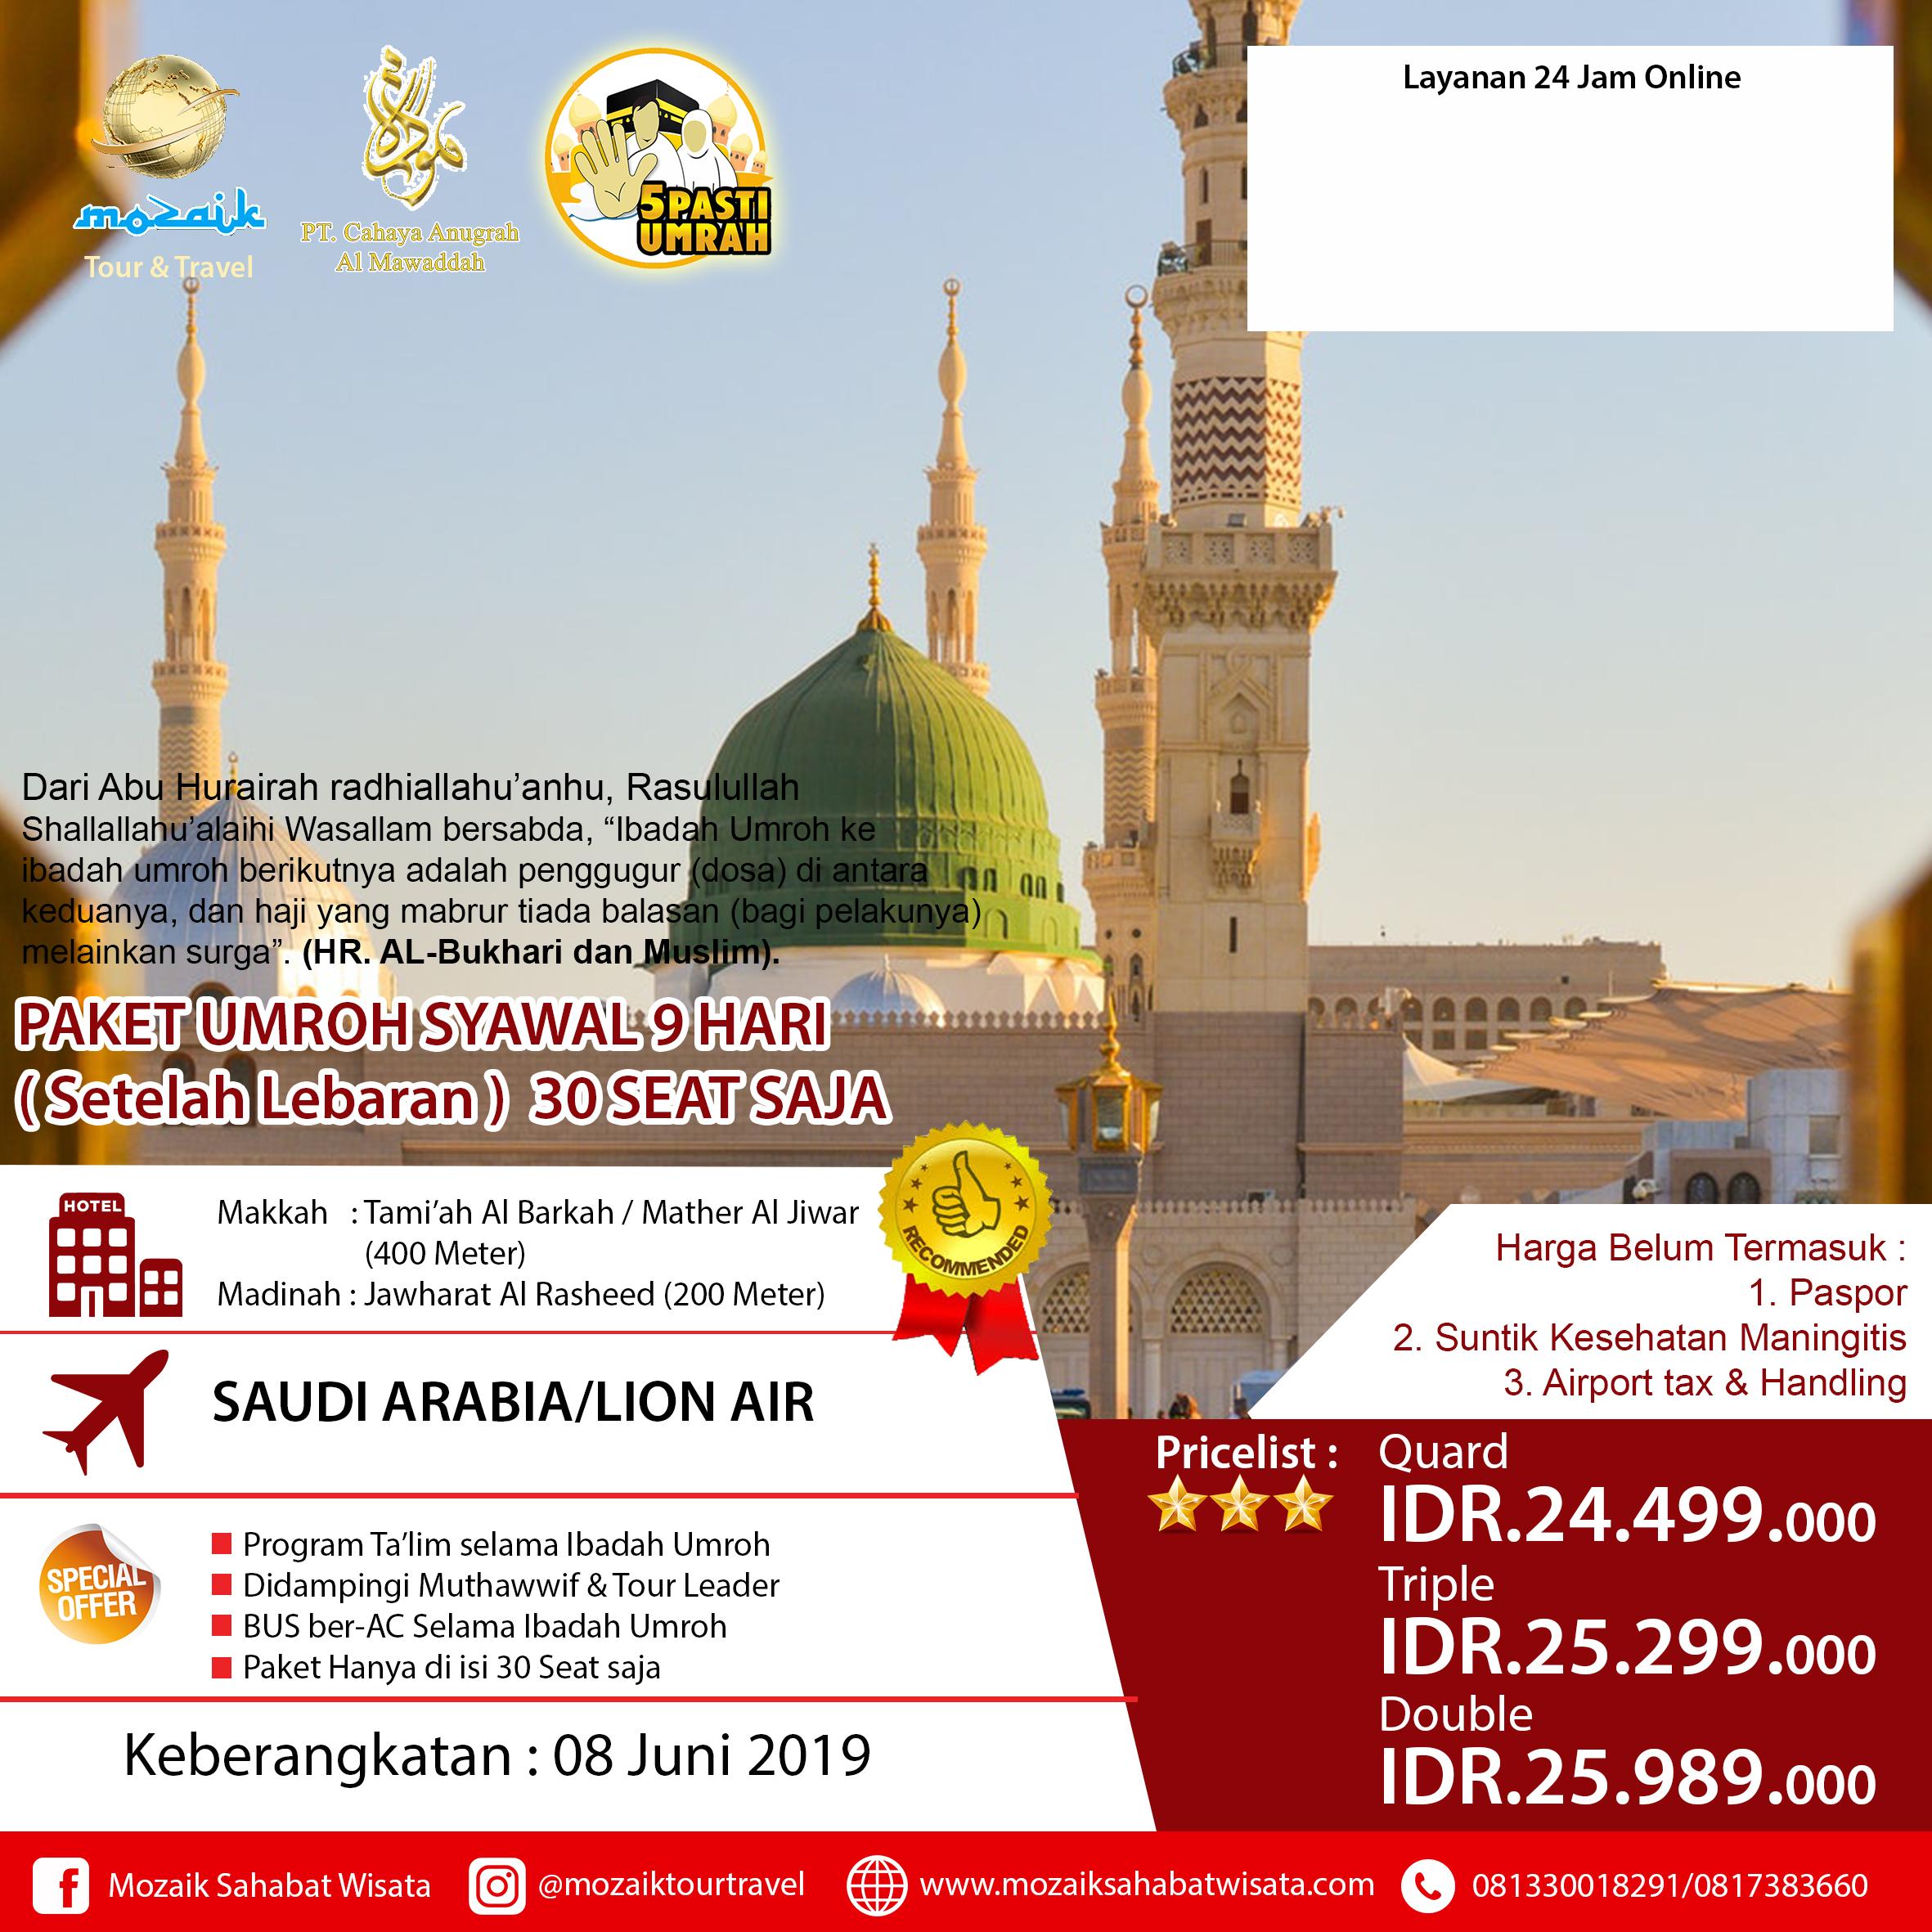 Paket Umroh Syawal 9 Hari 08 Juni 2019  adff5923f5